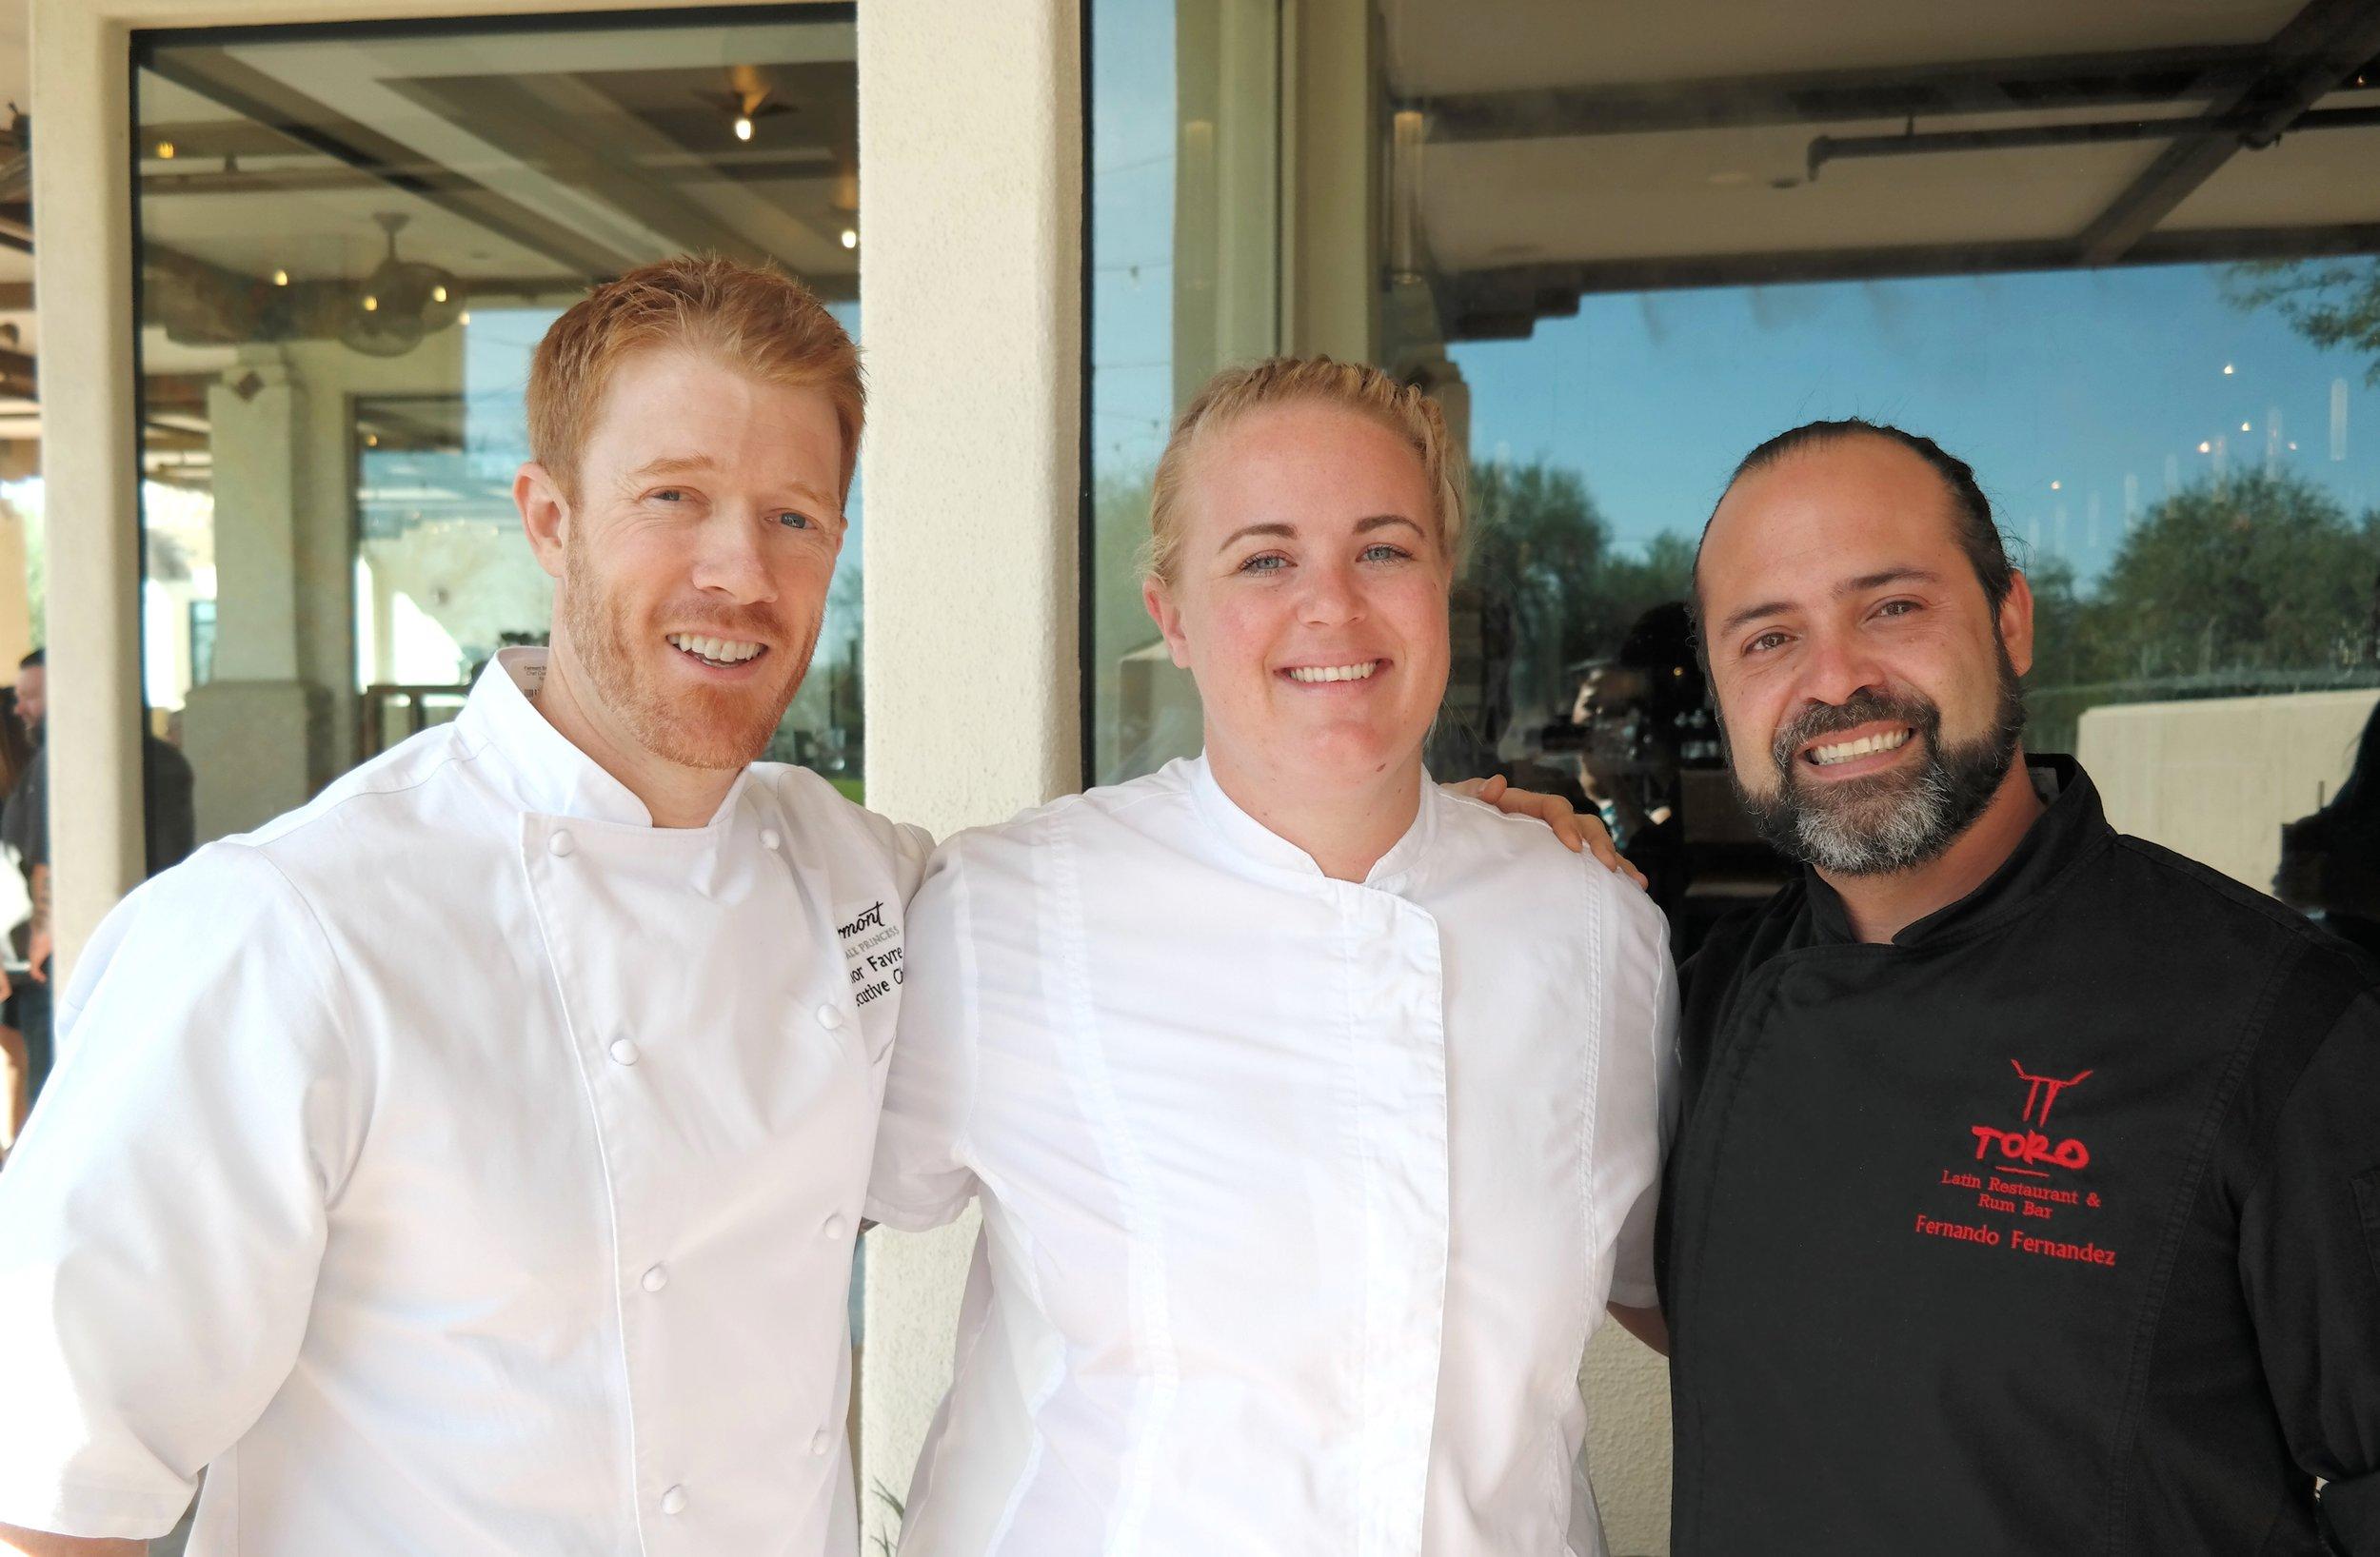 Chefs Favre, Garrant, and Fernandez